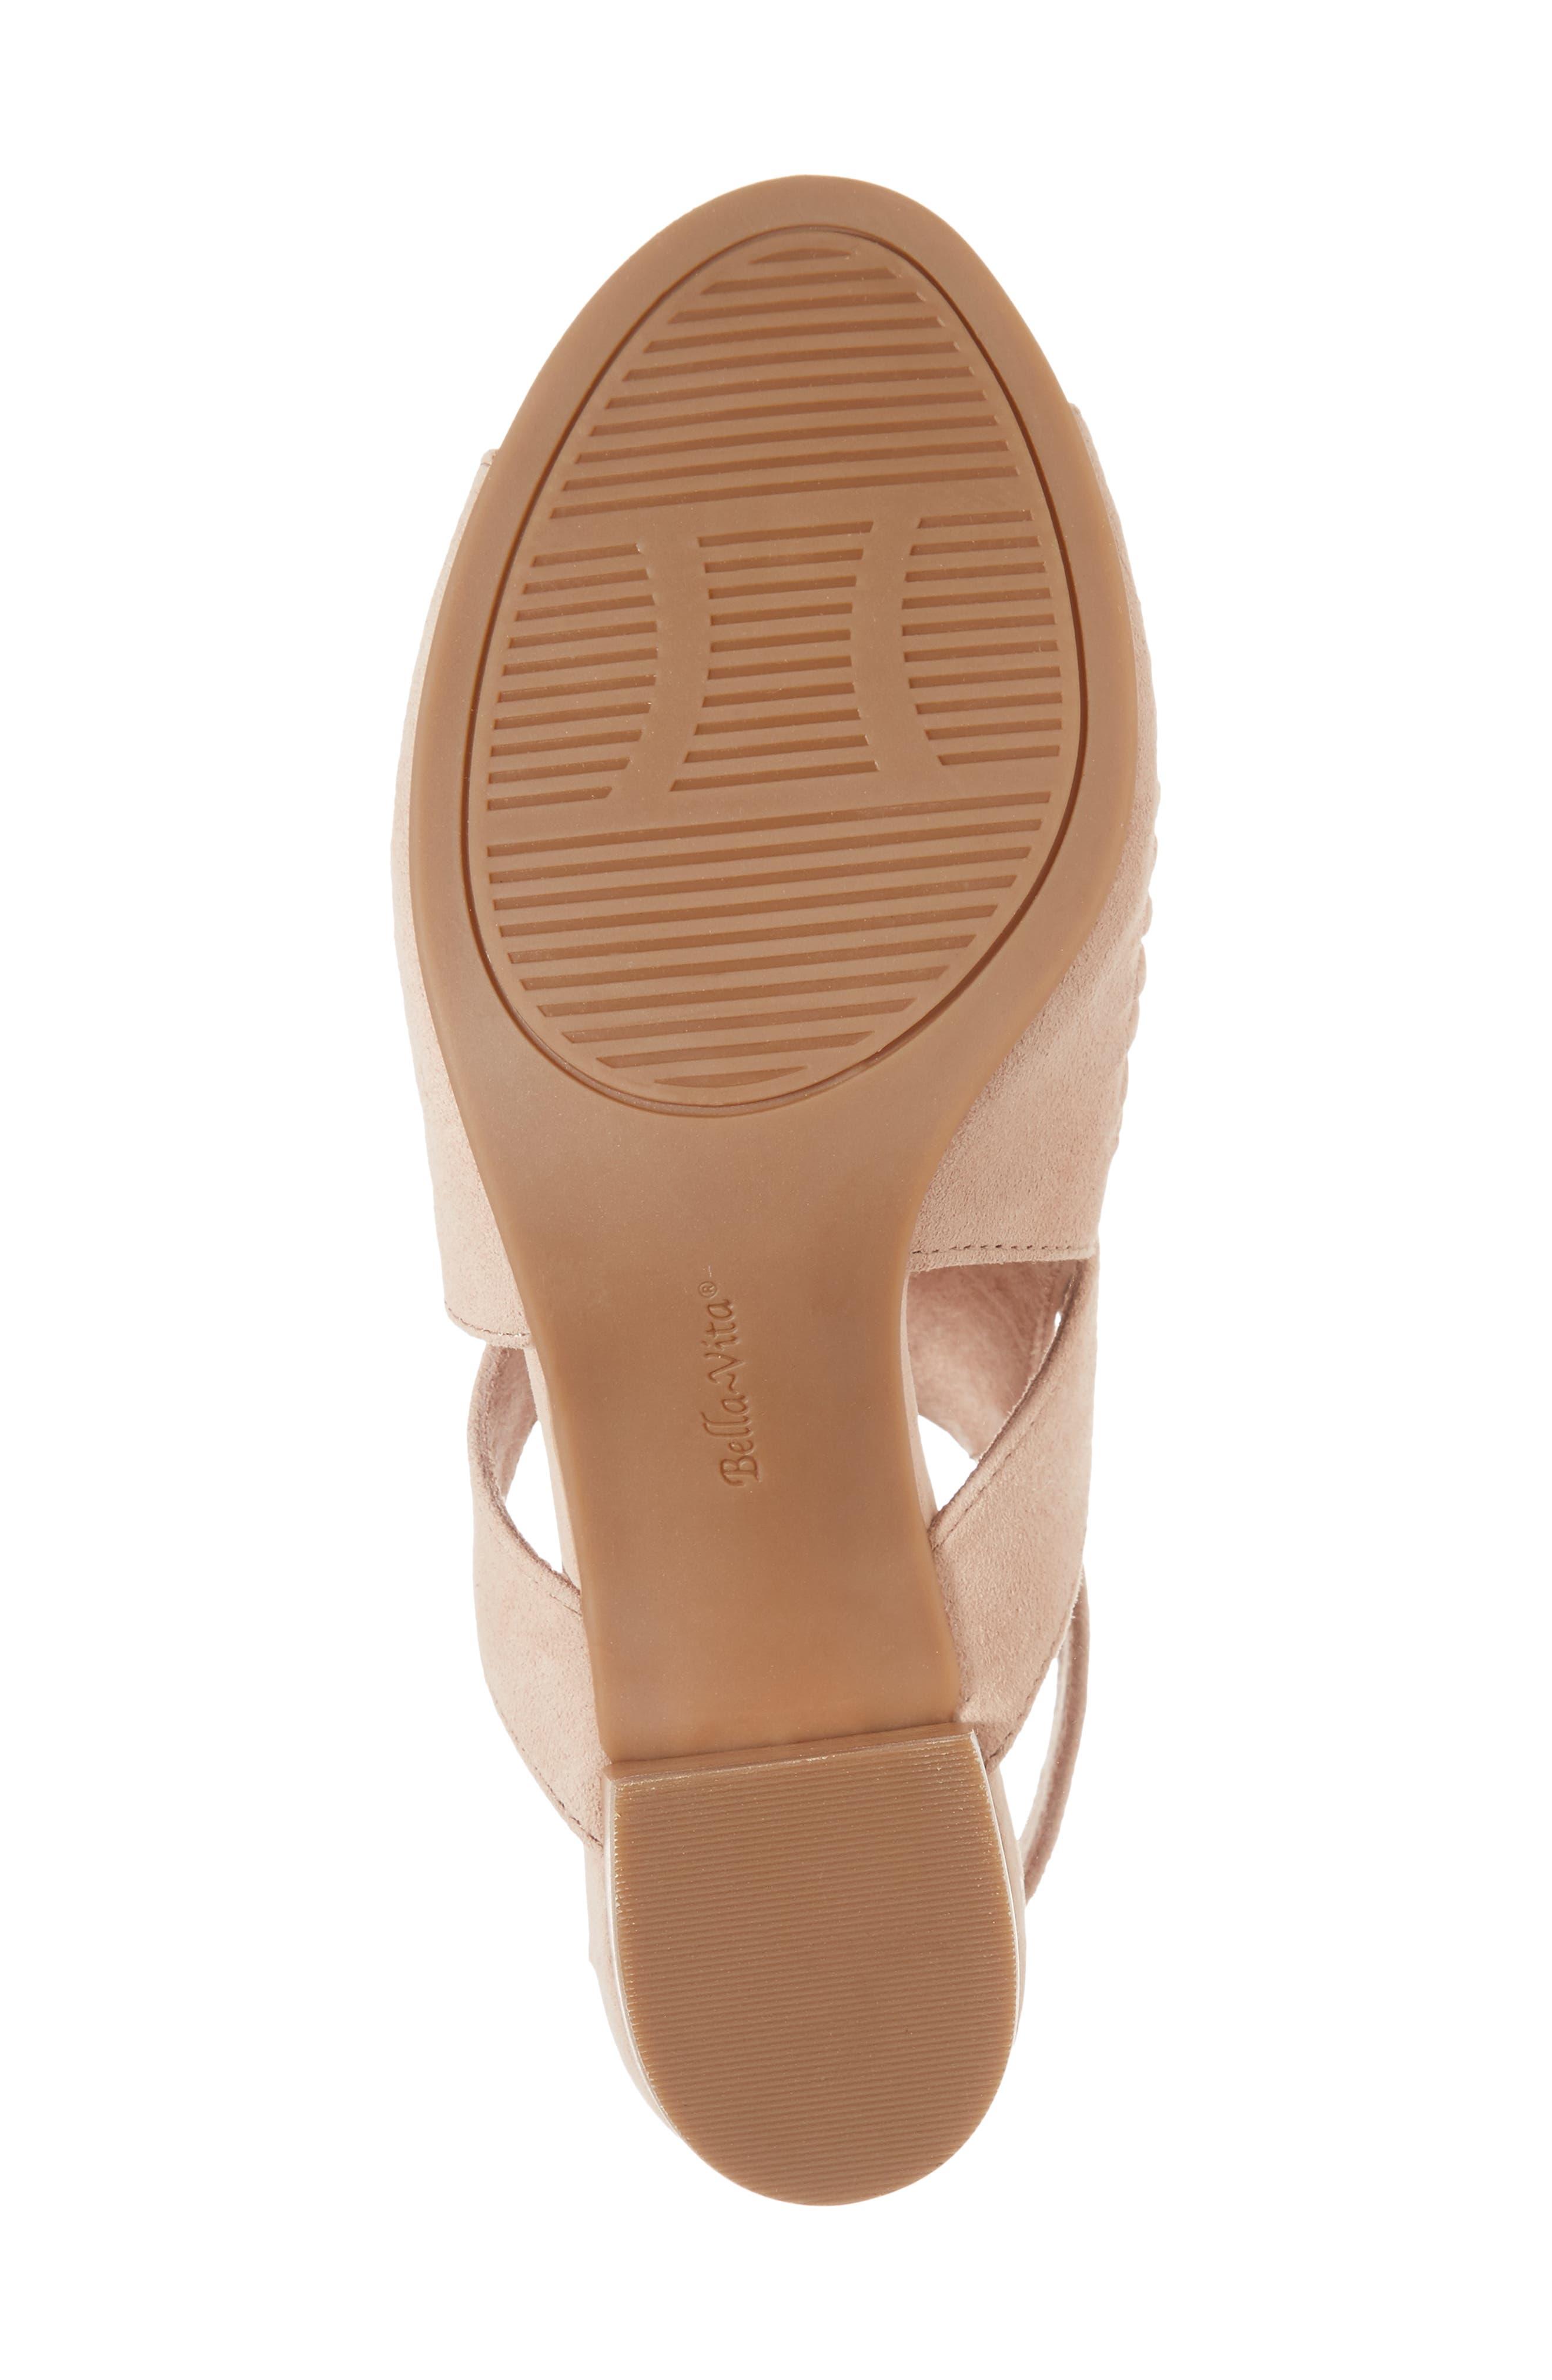 Finley Ankle Strap Sandal,                             Alternate thumbnail 30, color,